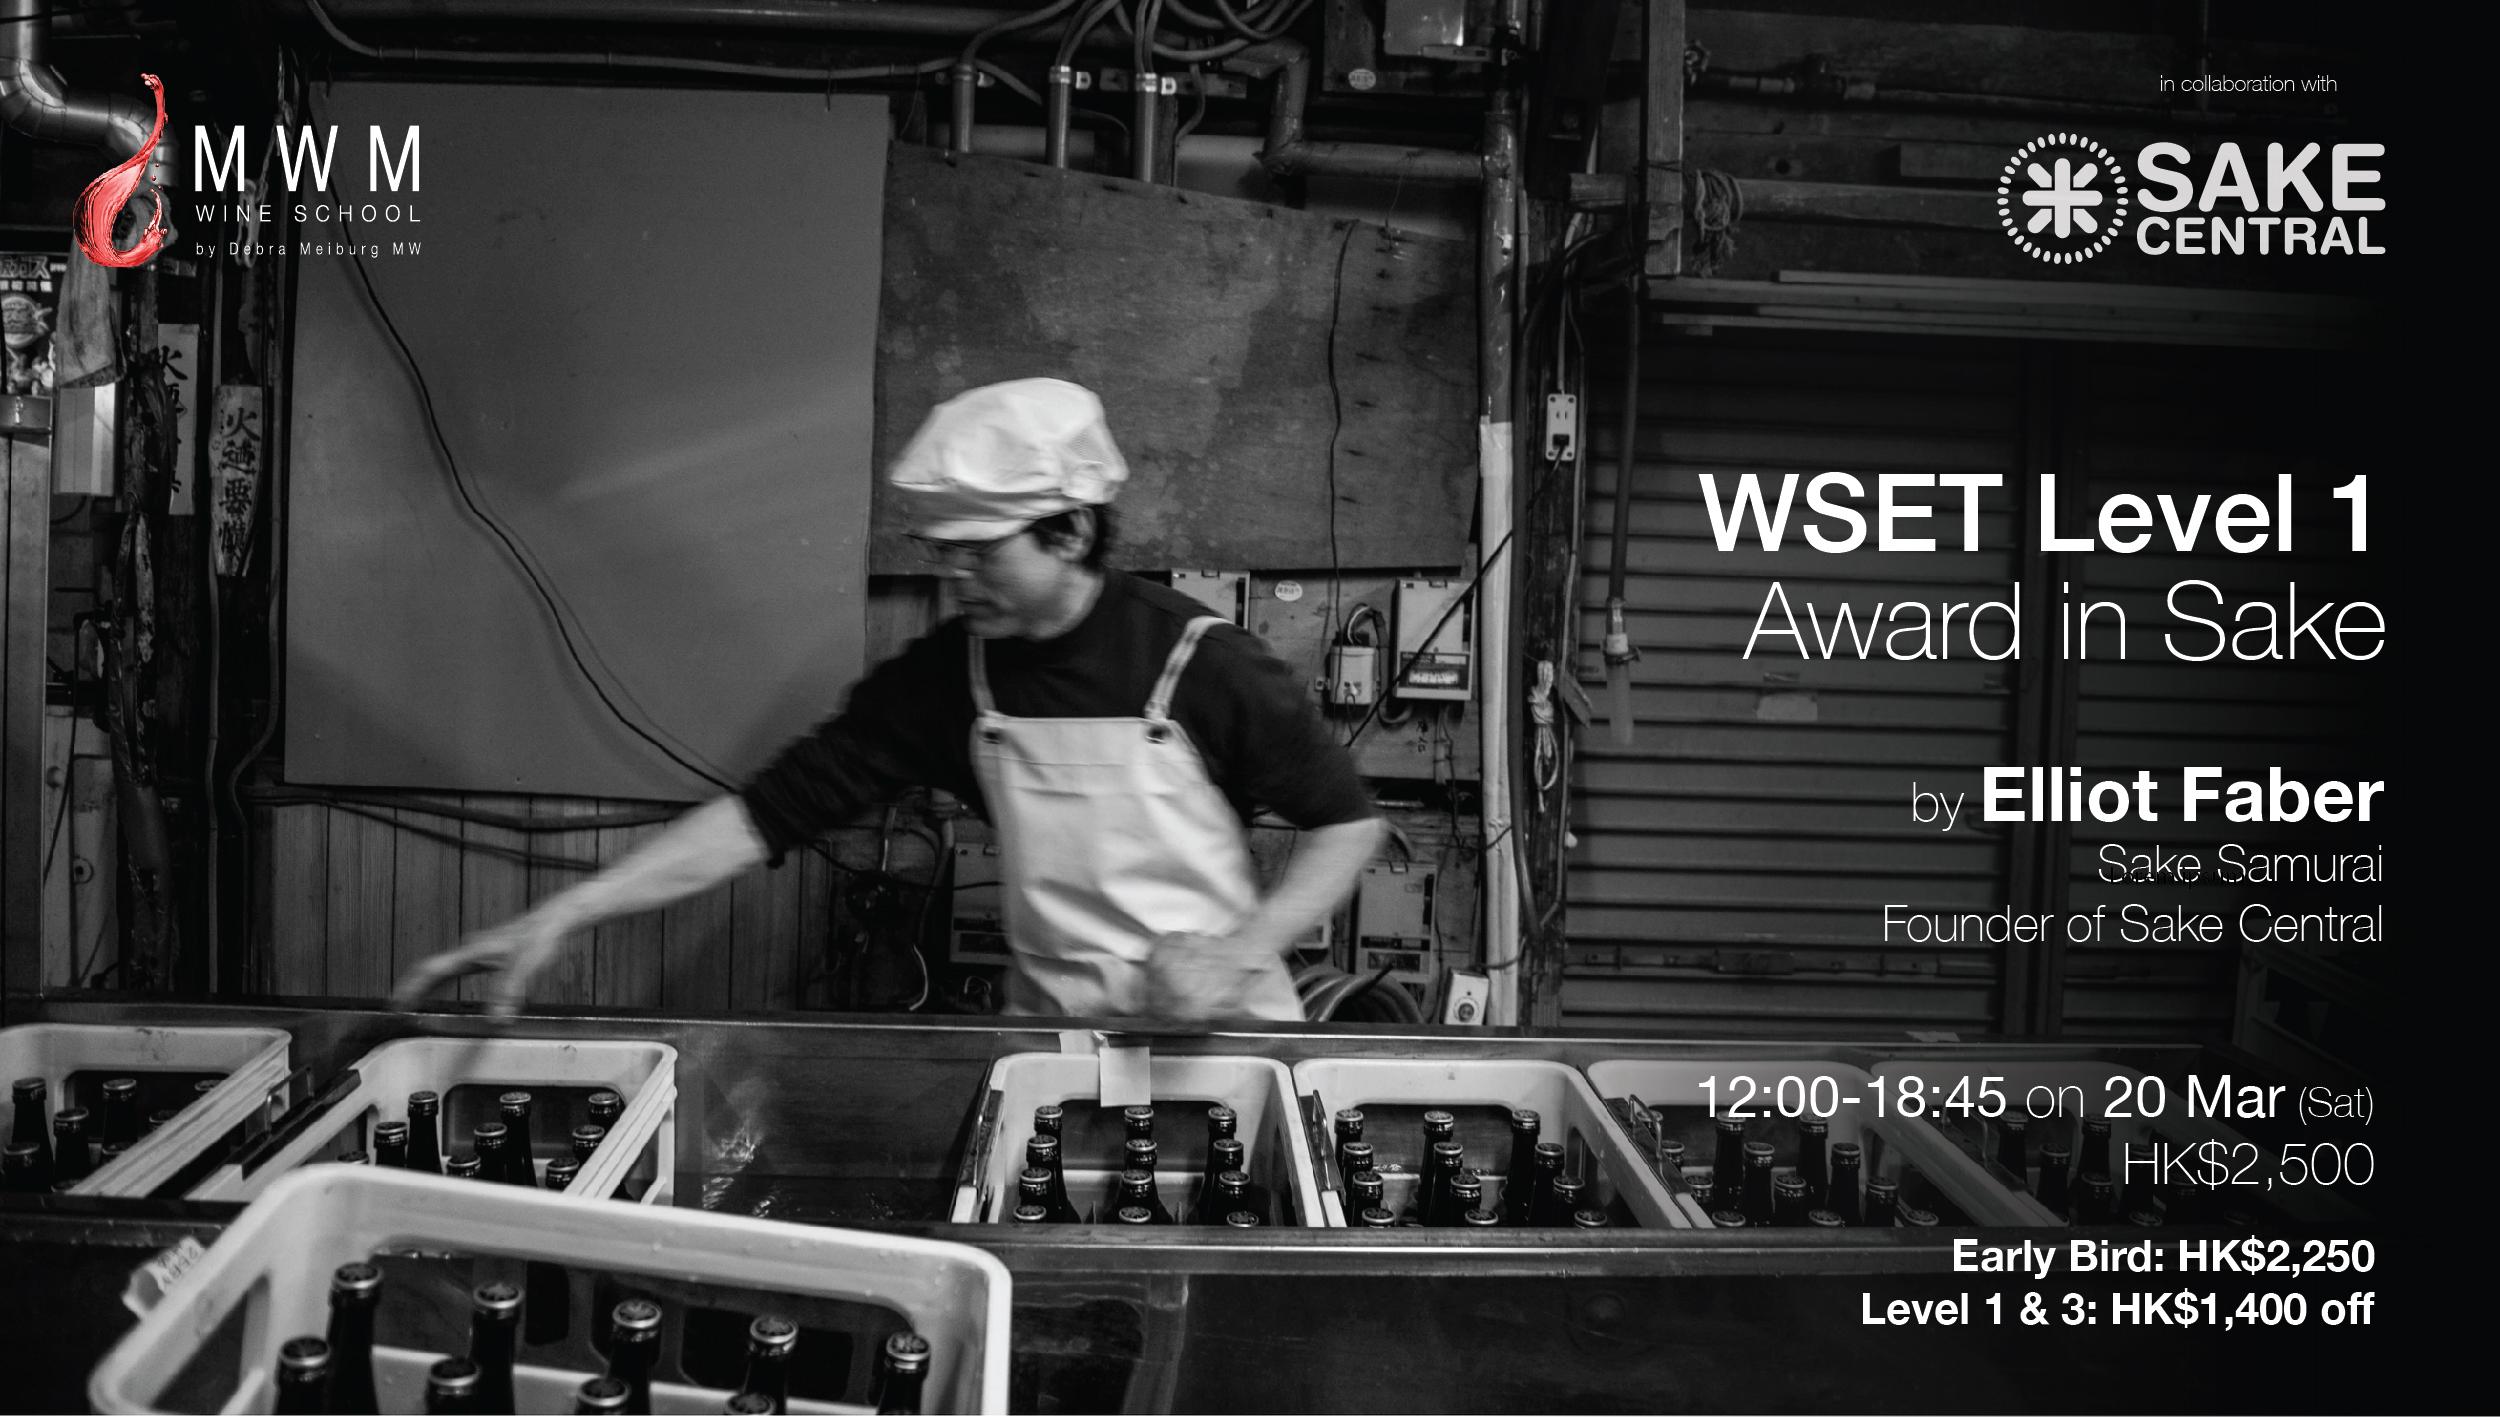 WSET Level 1 Award in Sake at MWM Wine School